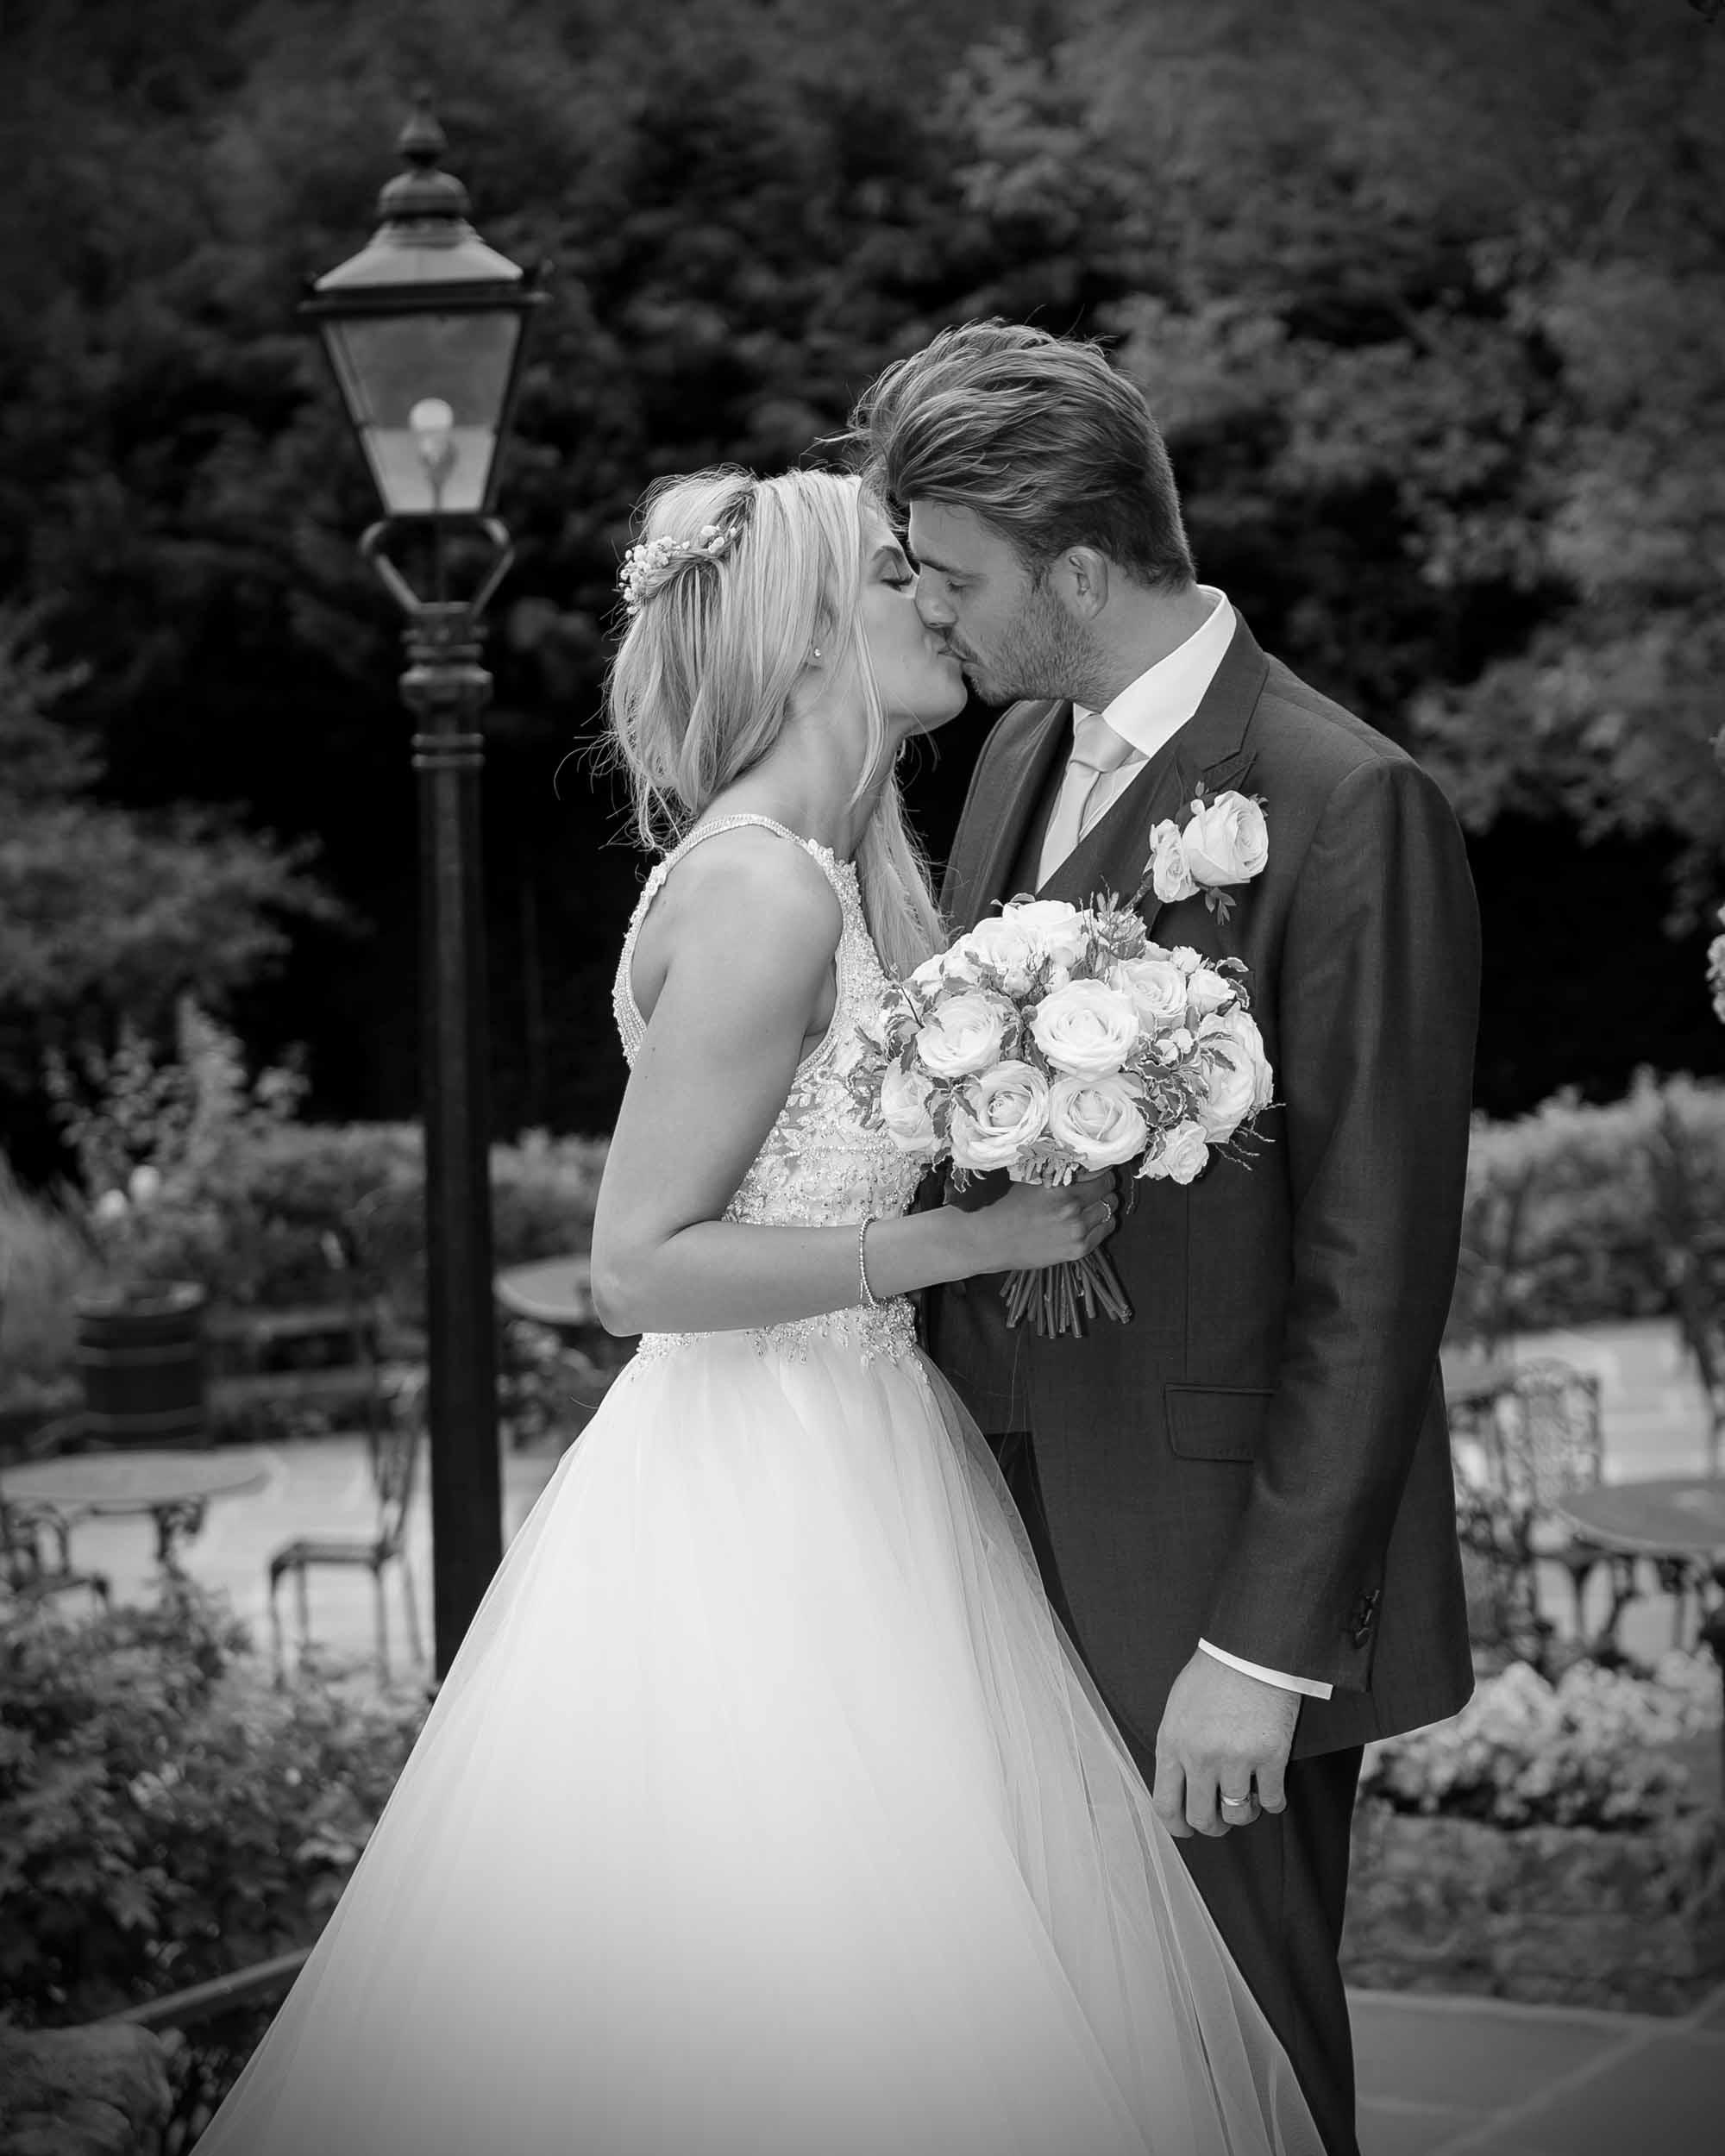 Emma&Victorwedding_0345_edited-2